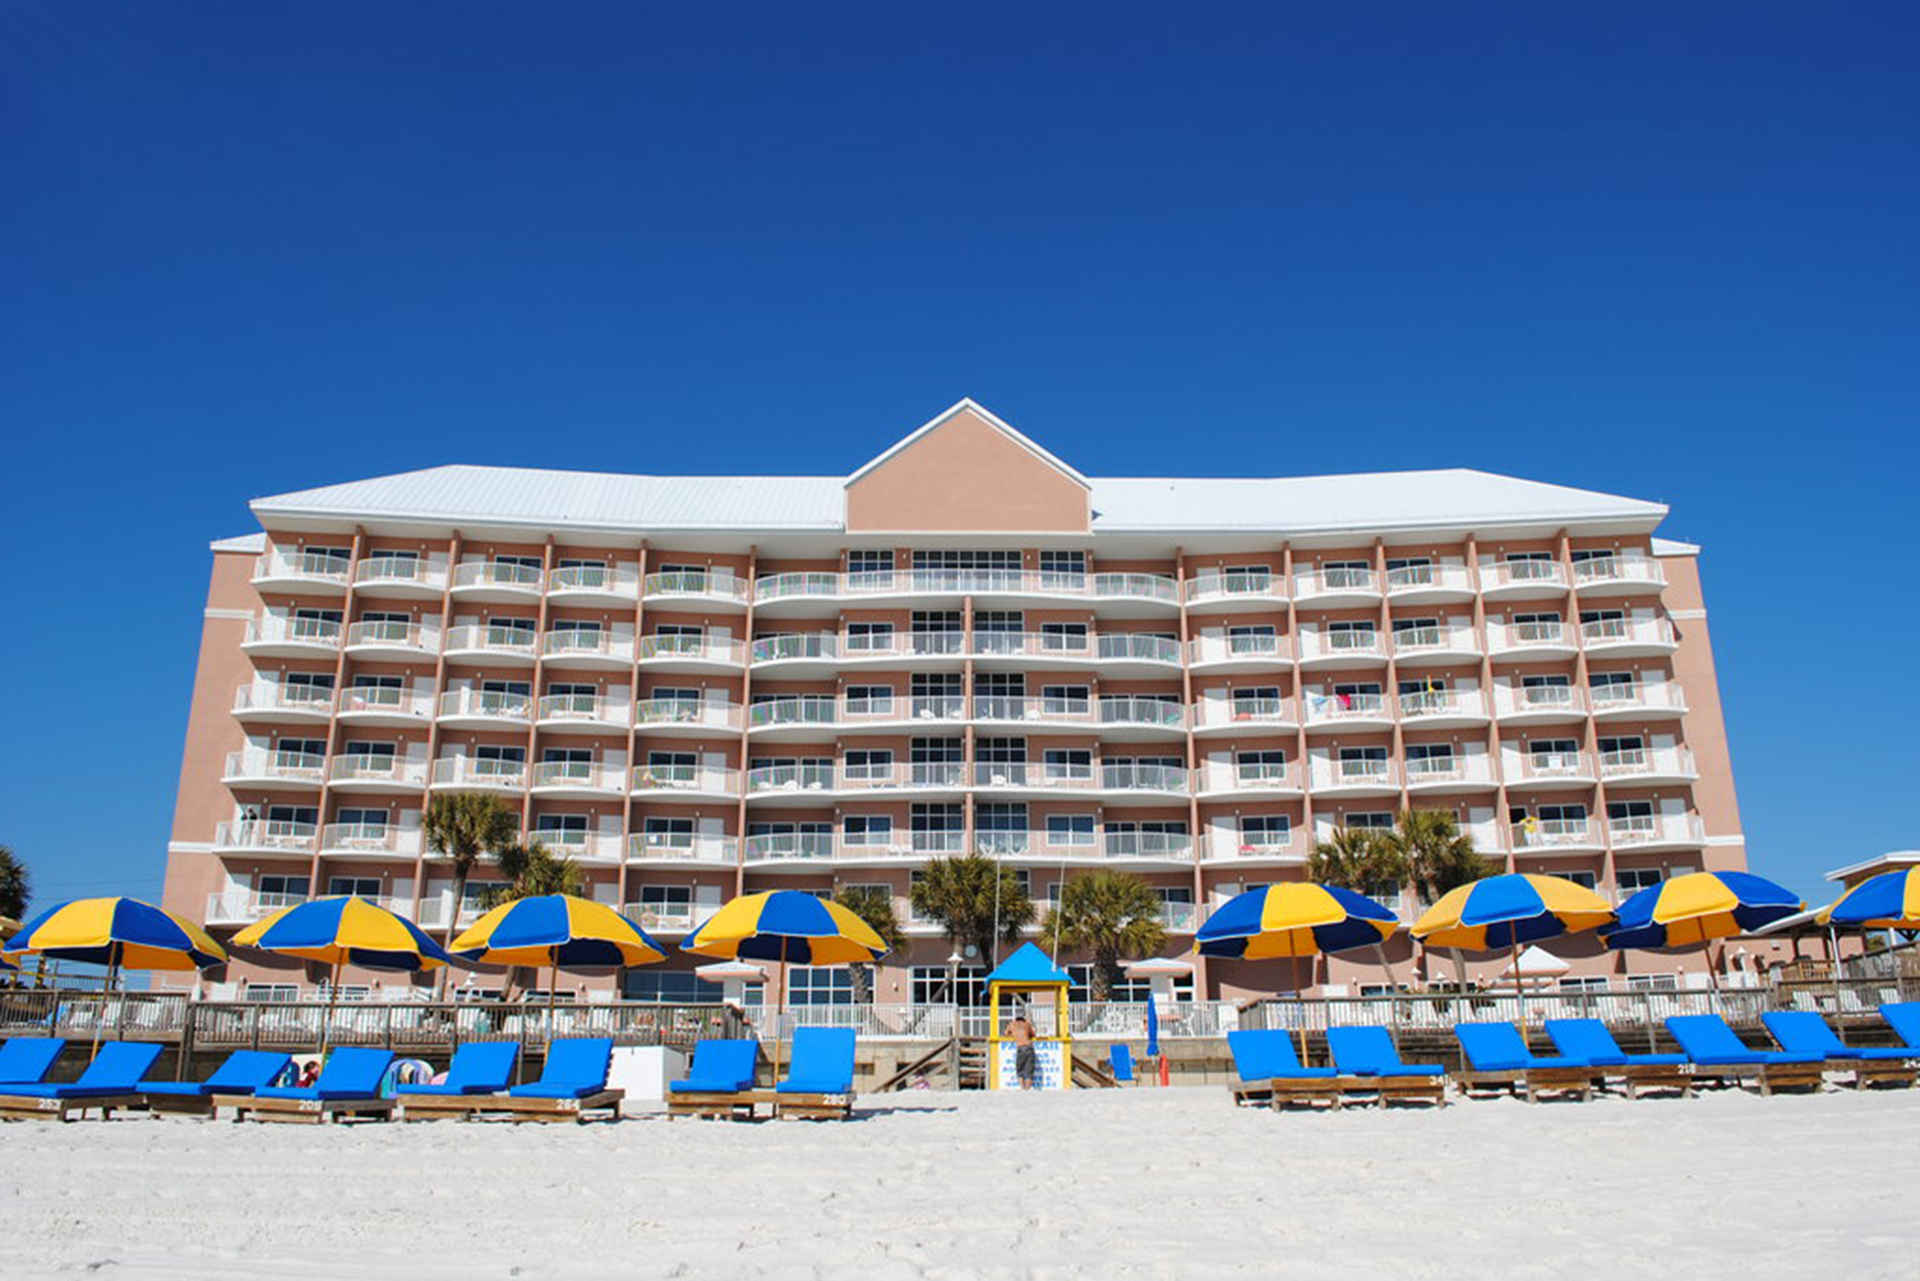 Palmetto Inn & Suites in Panama City Beach, FL